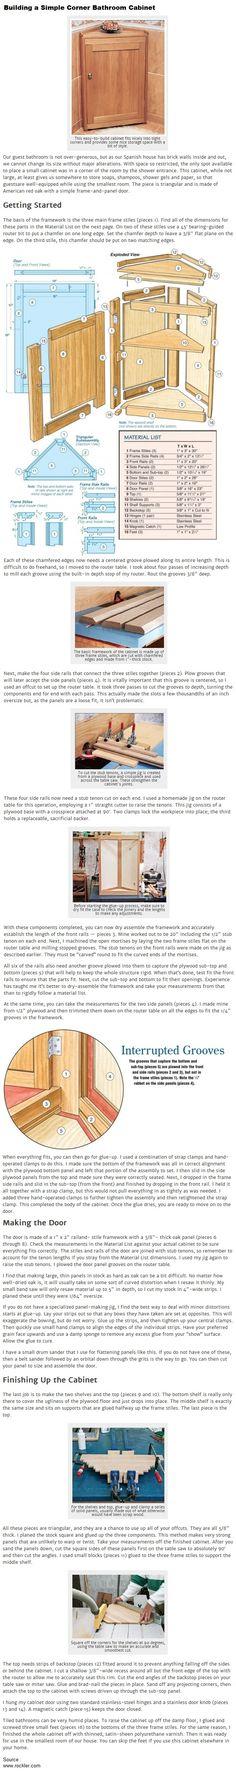 Building a Simple Corner Bathroom Cabinet | WoodworkerZ.com